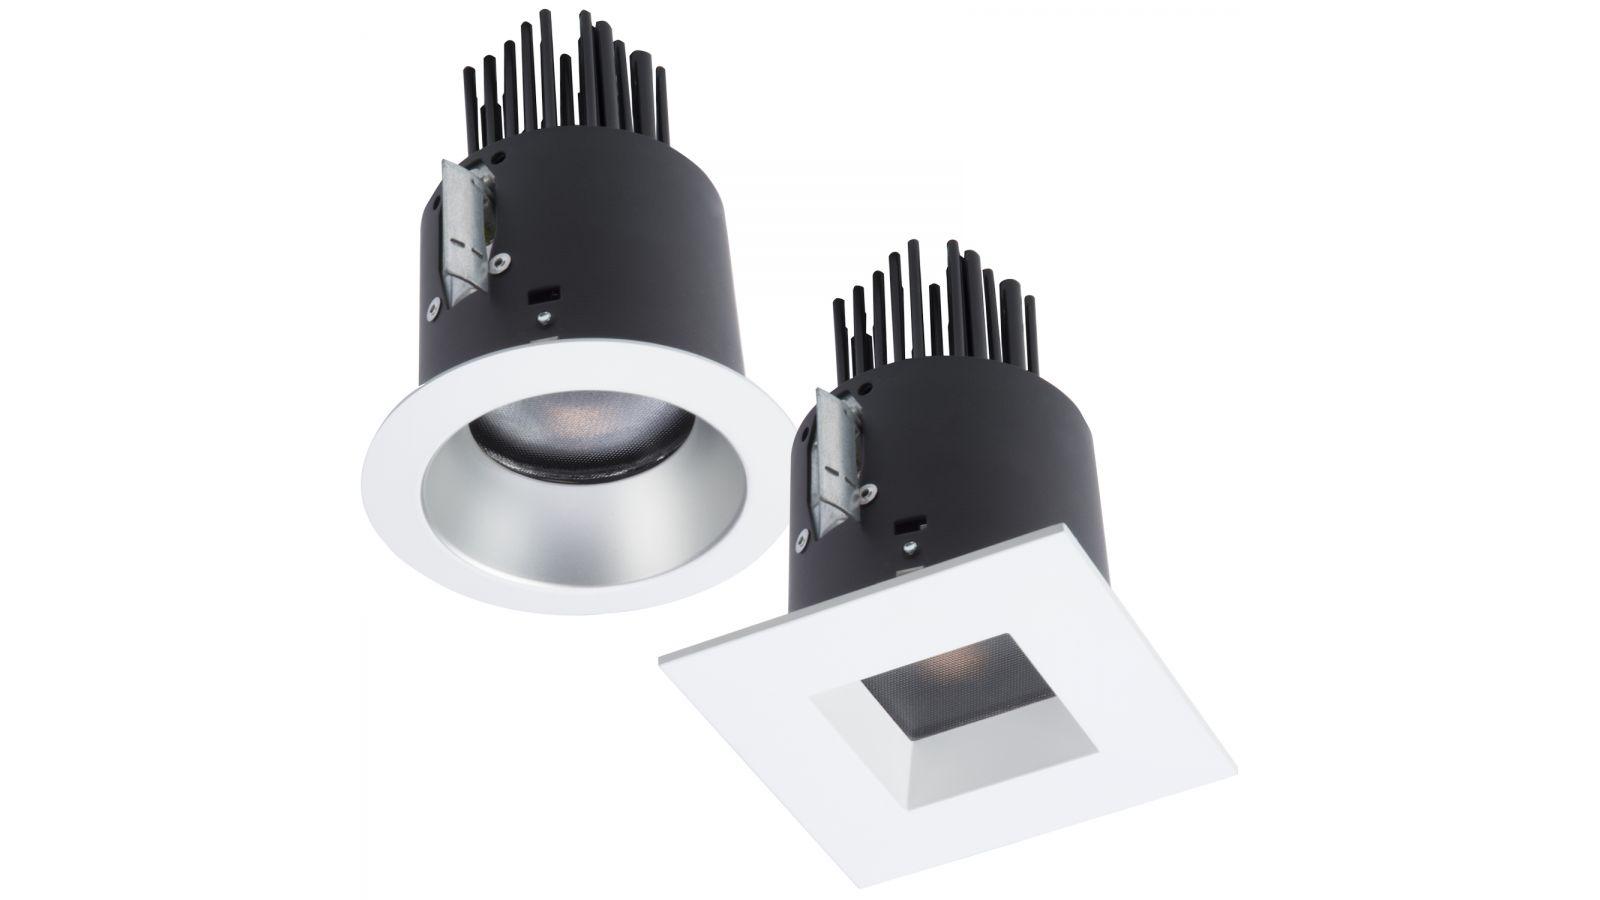 Portfolio 2-inch LED Downlights